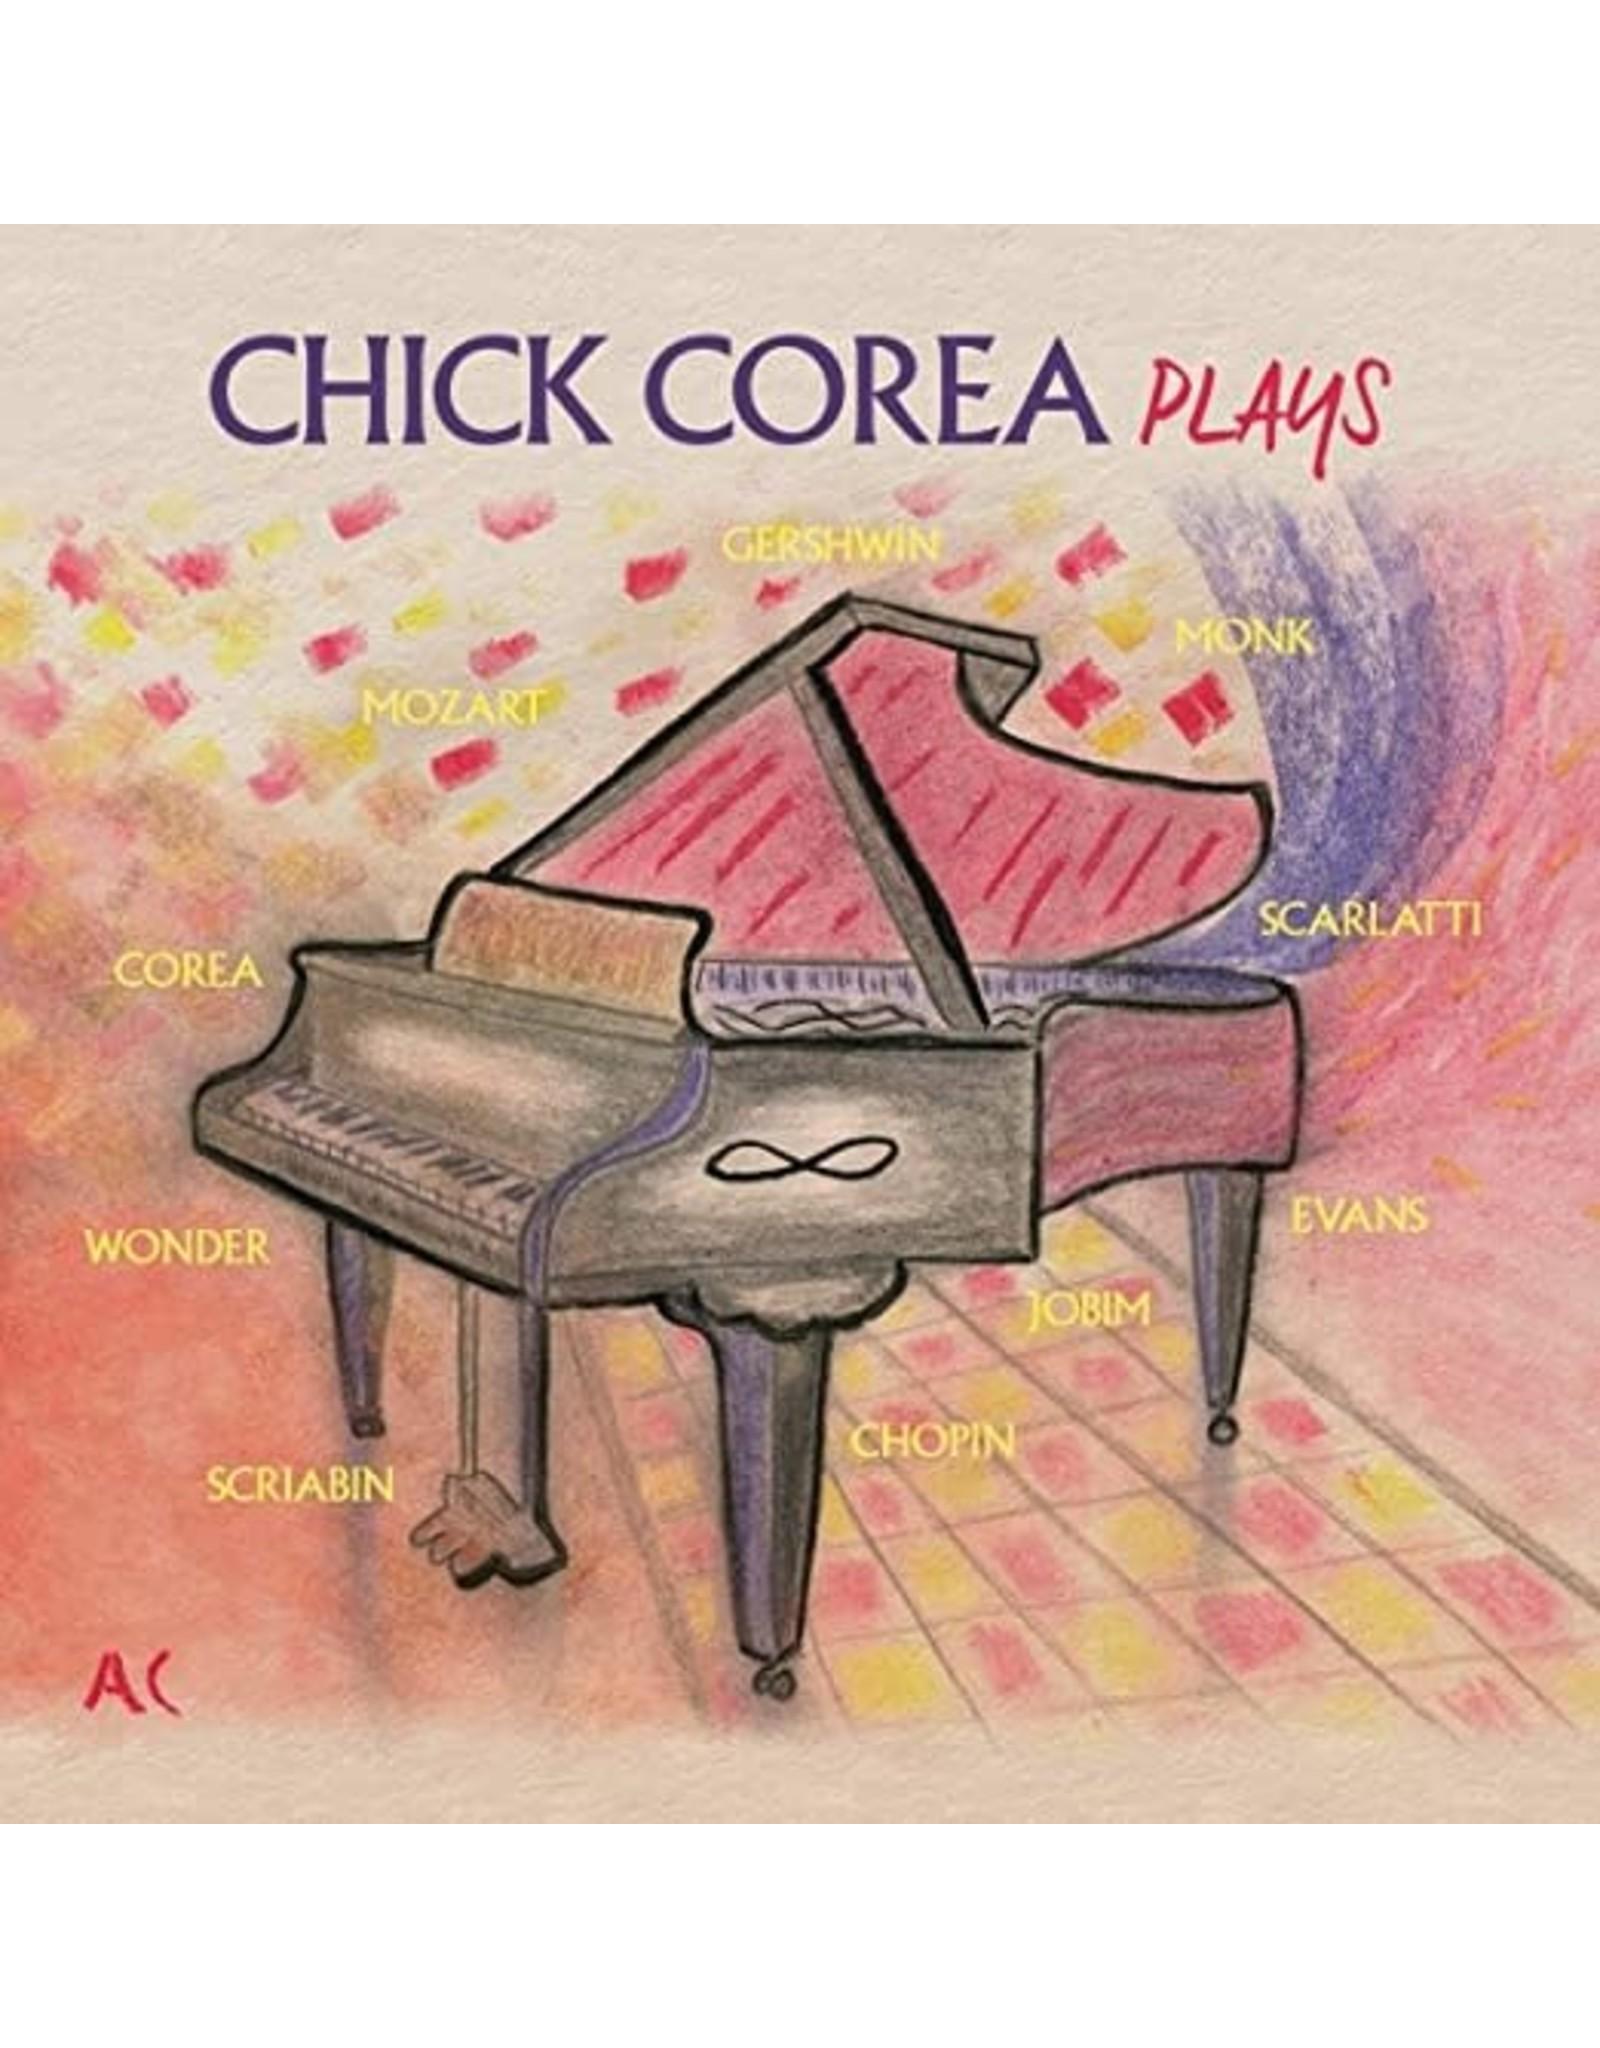 Chick Corea - Plays